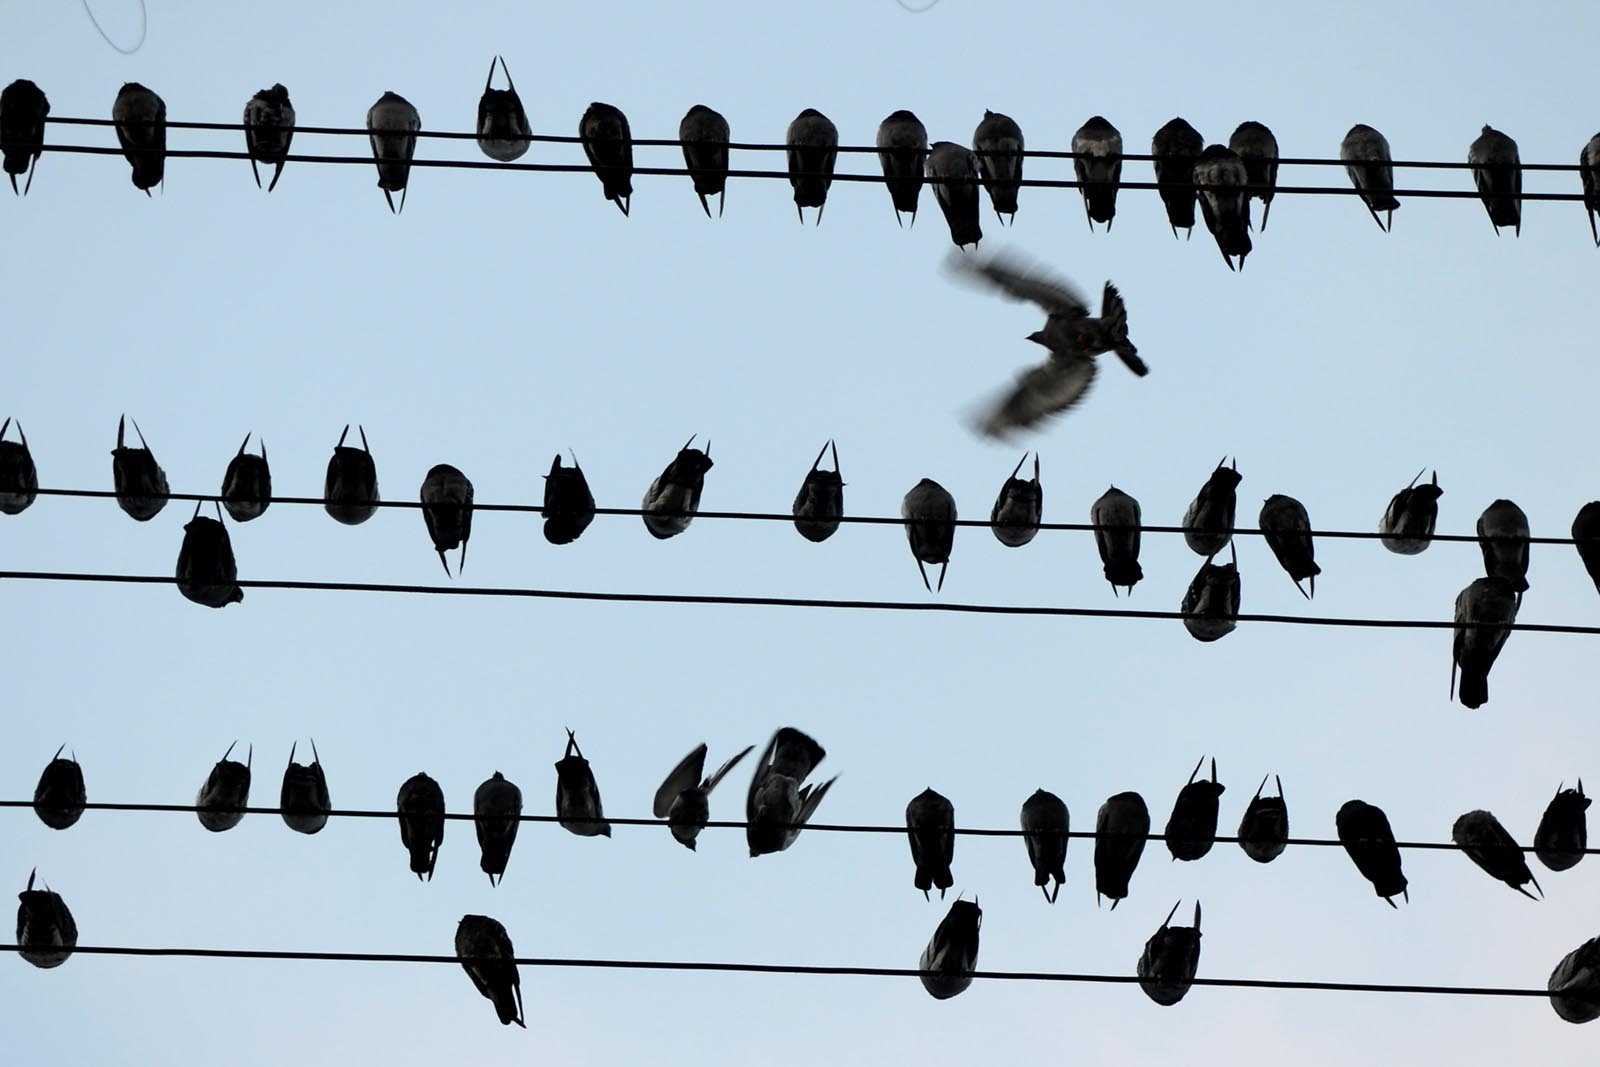 SNAP: The Birds